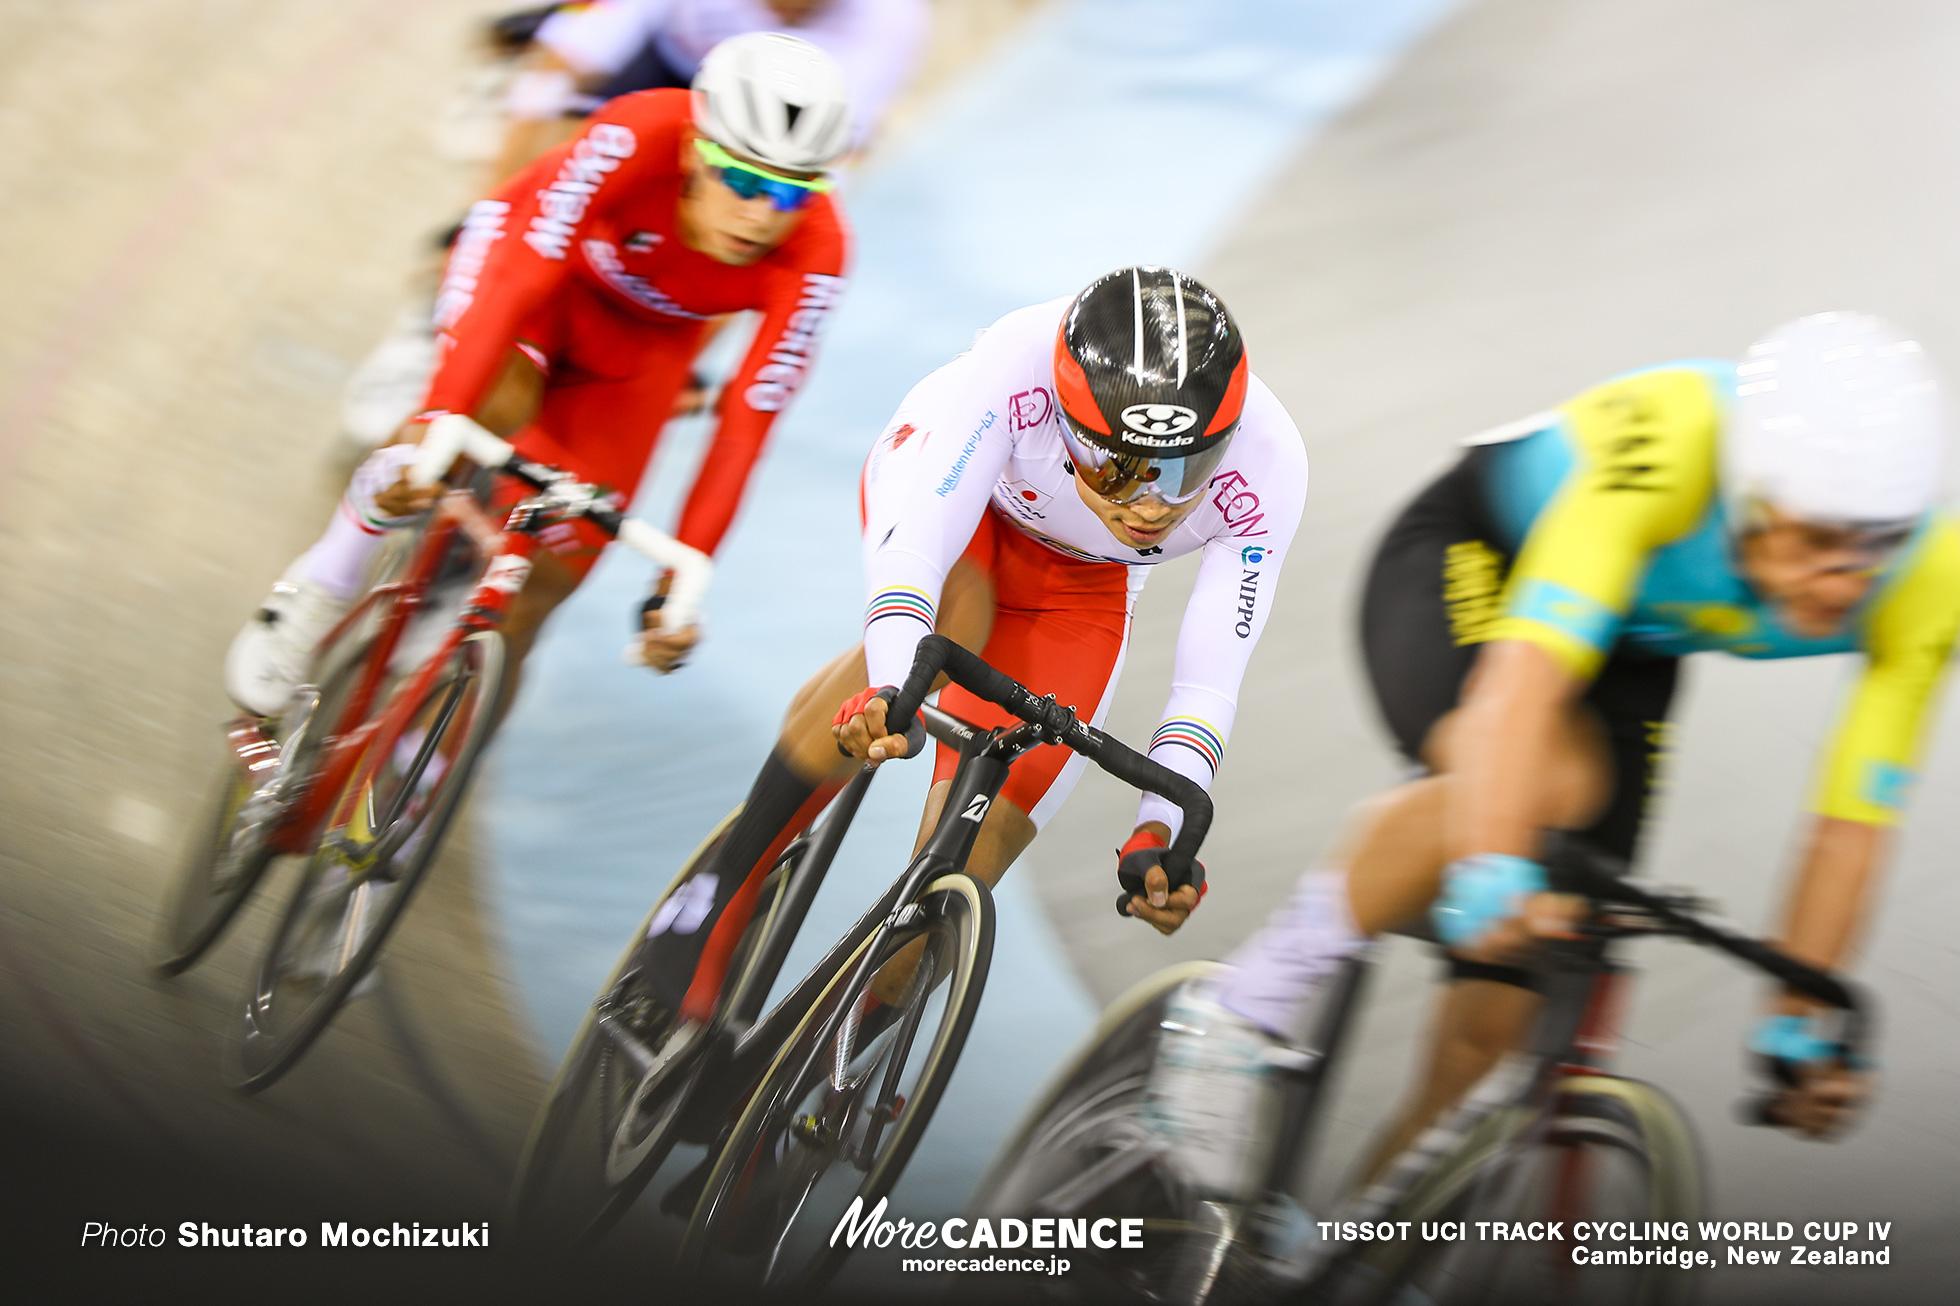 Scratch Race / Men's Omnium / TISSOT UCI TRACK CYCLING WORLD CUP IV, Cambridge, New Zealand, 橋本英也